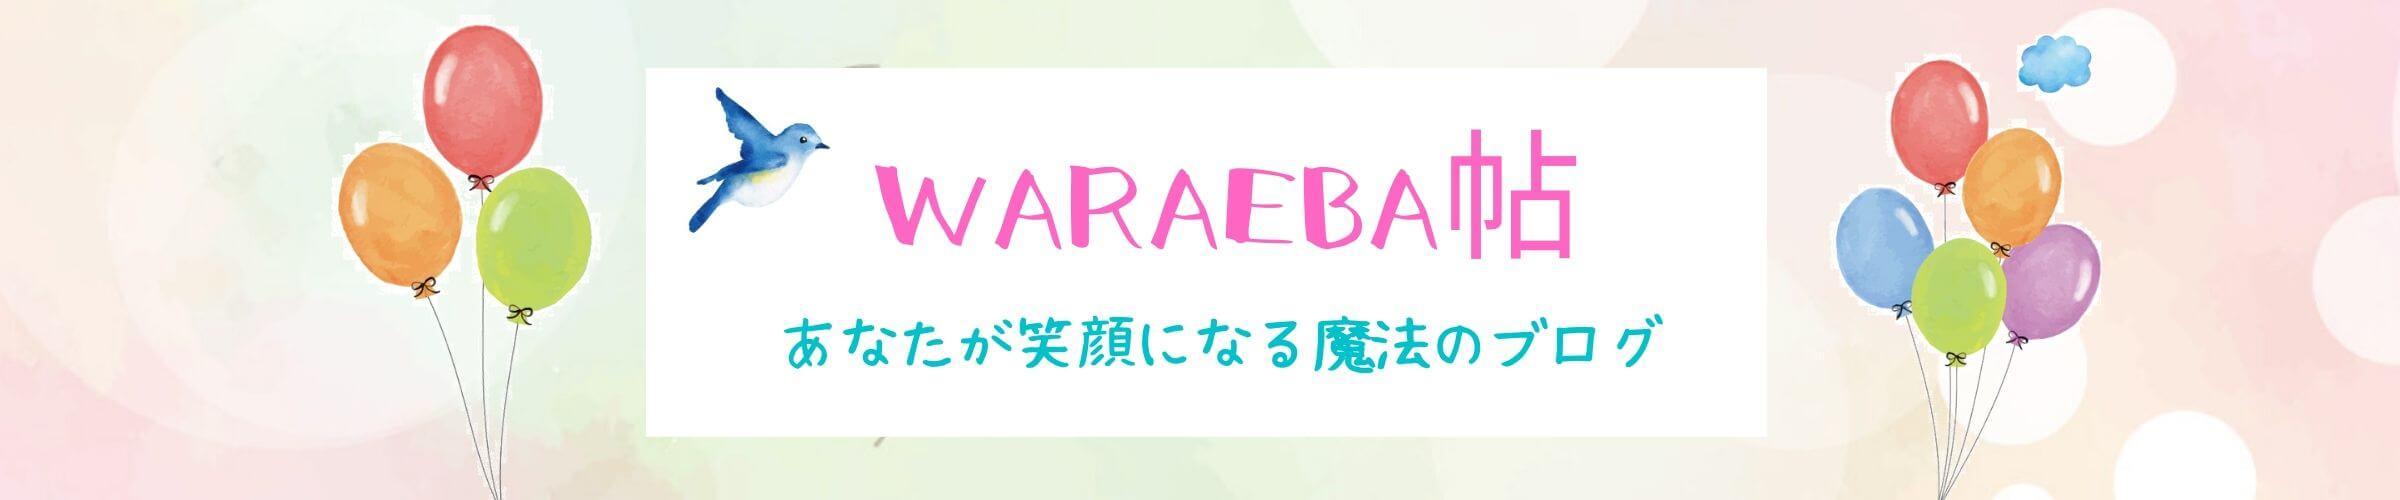 WARAEBA帖